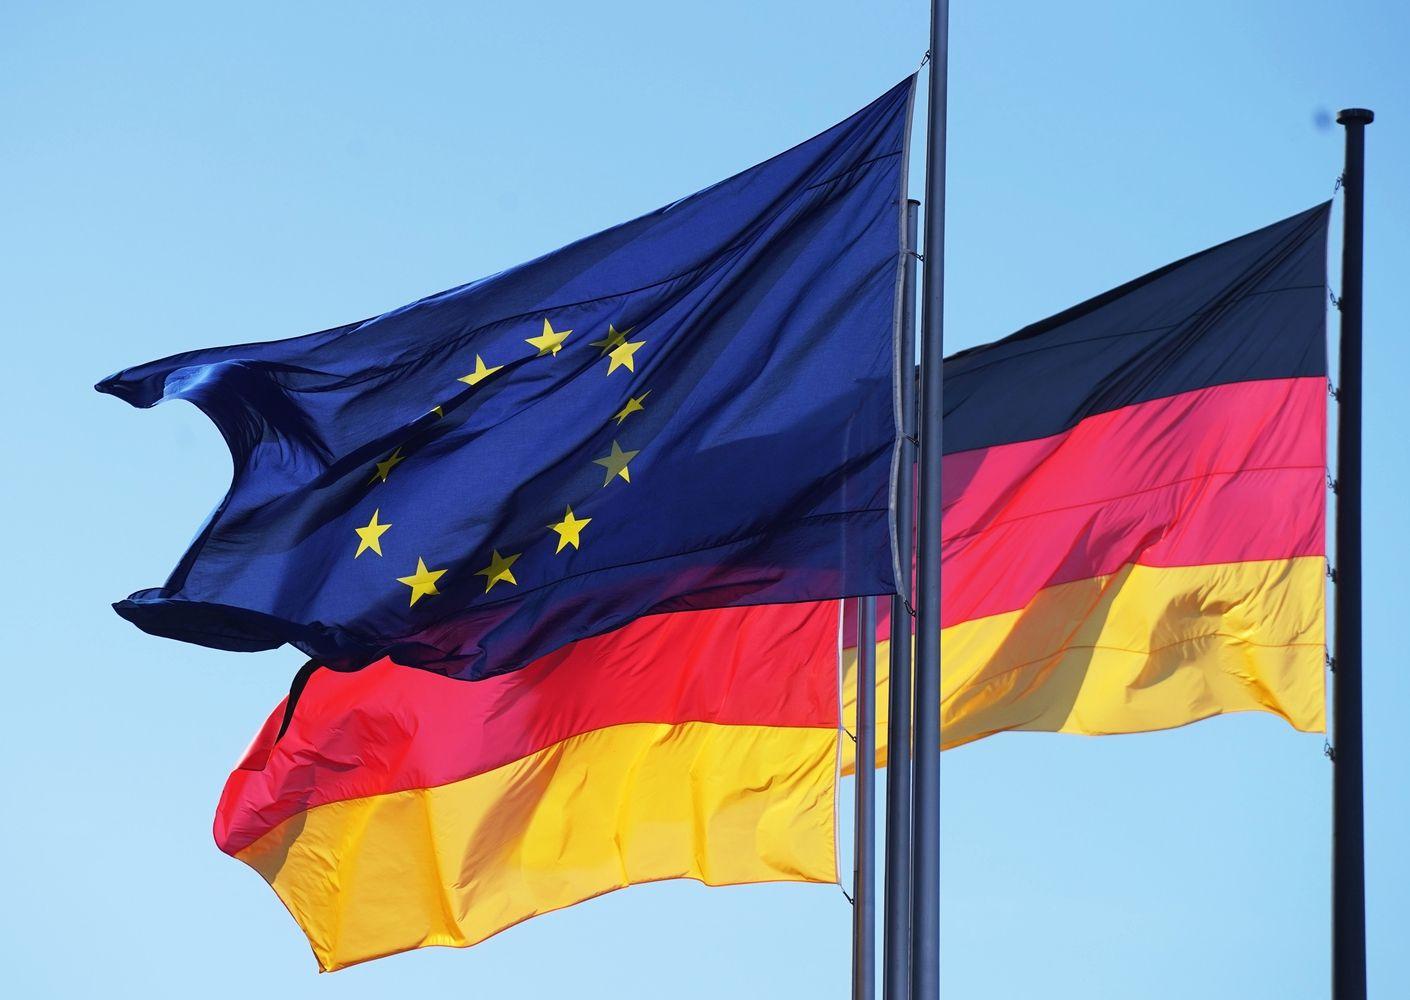 Visi Vokietijos ekonomikos sektoriai augo